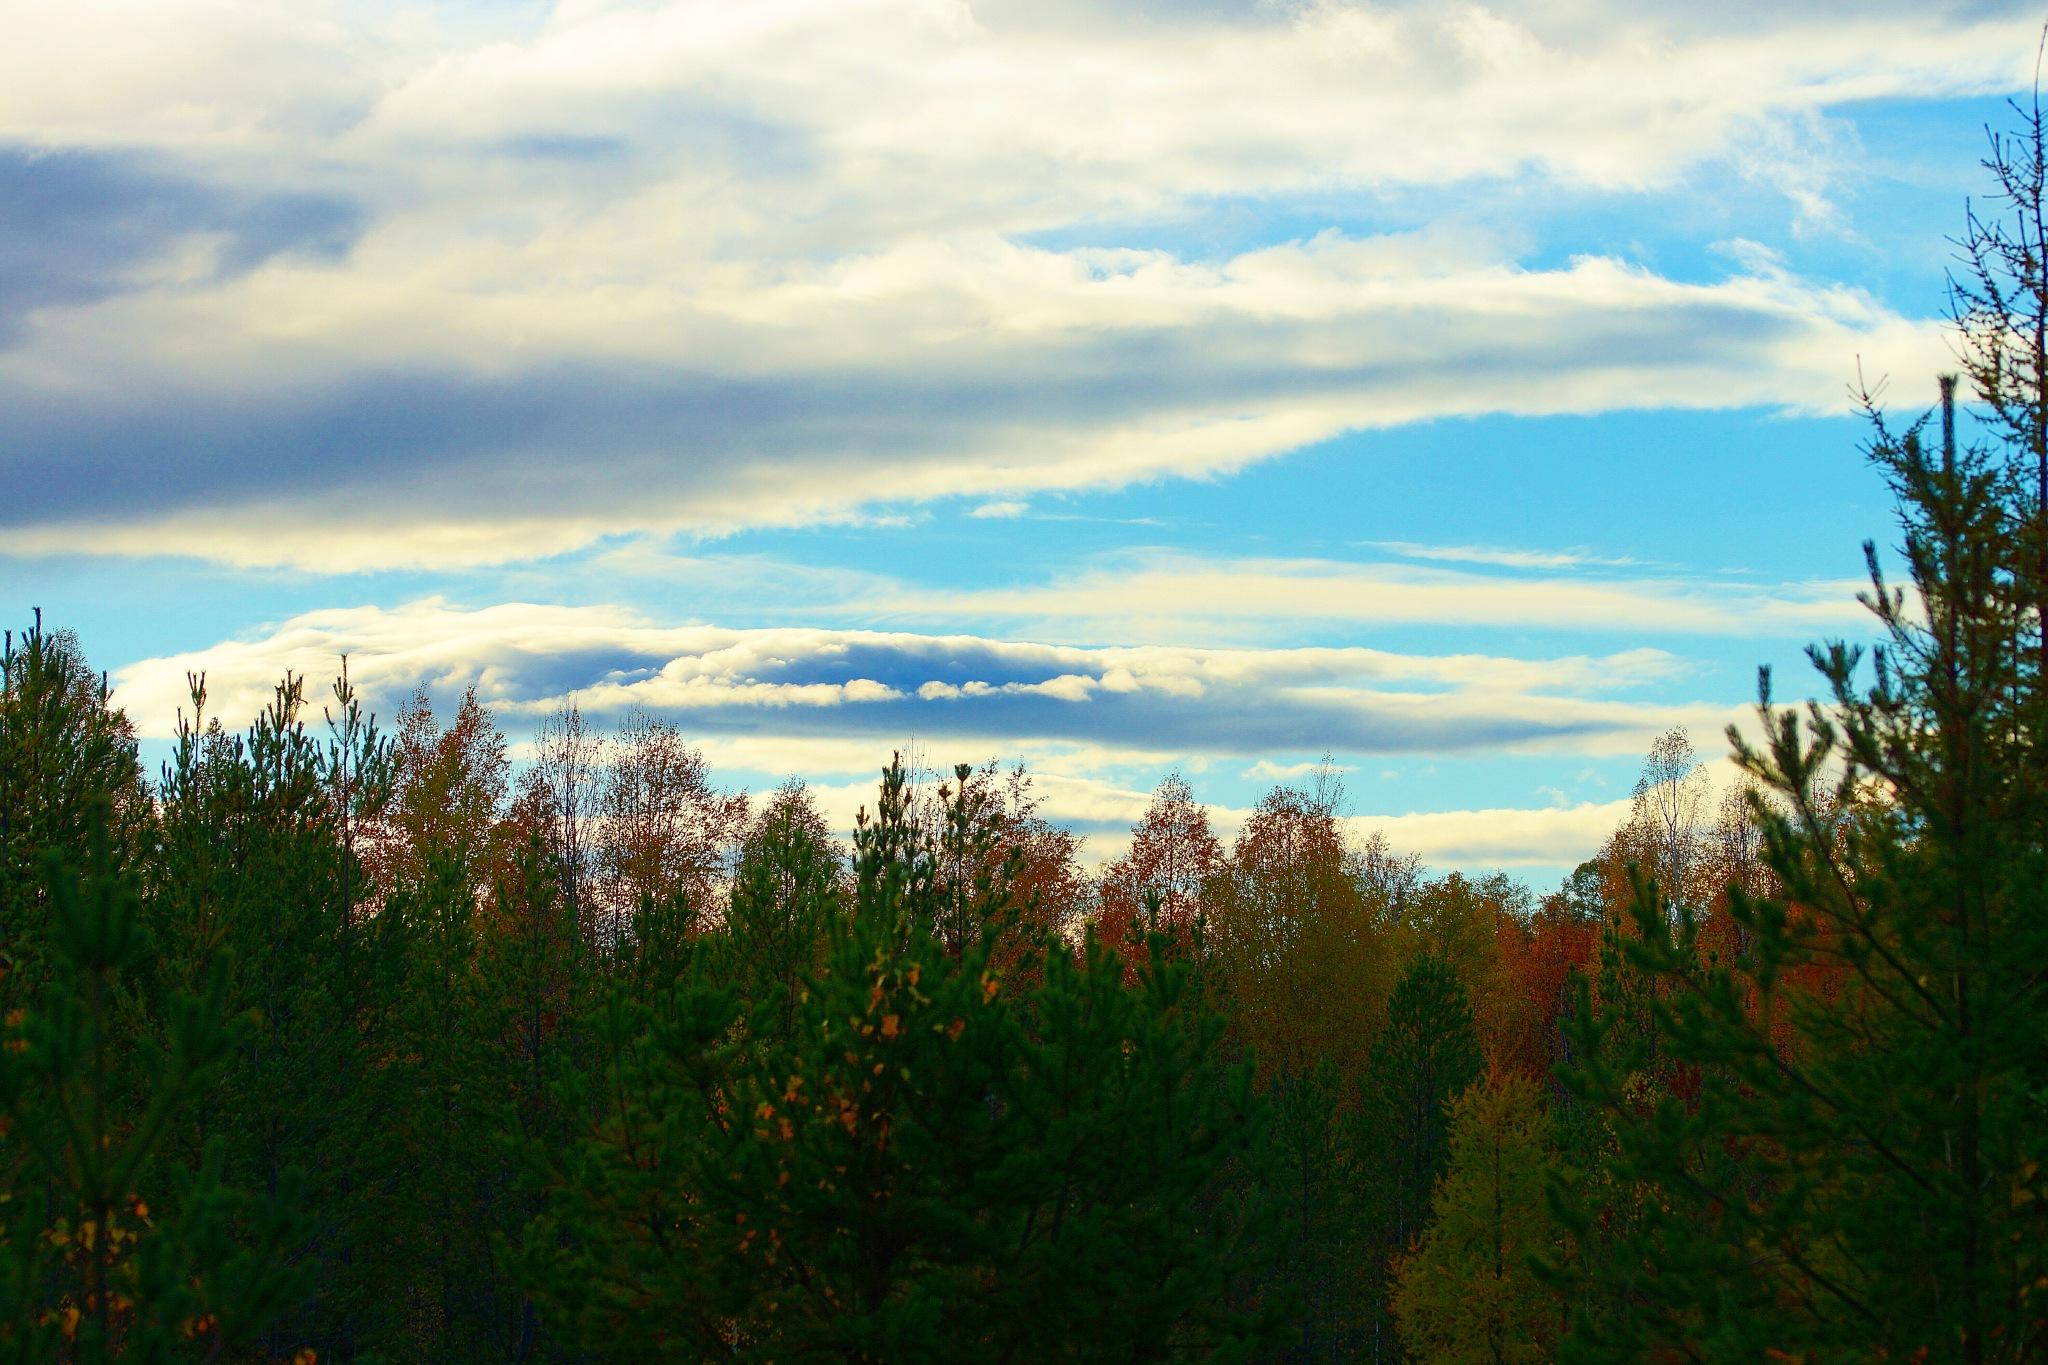 Clouds of October by sergey.parfeniuk